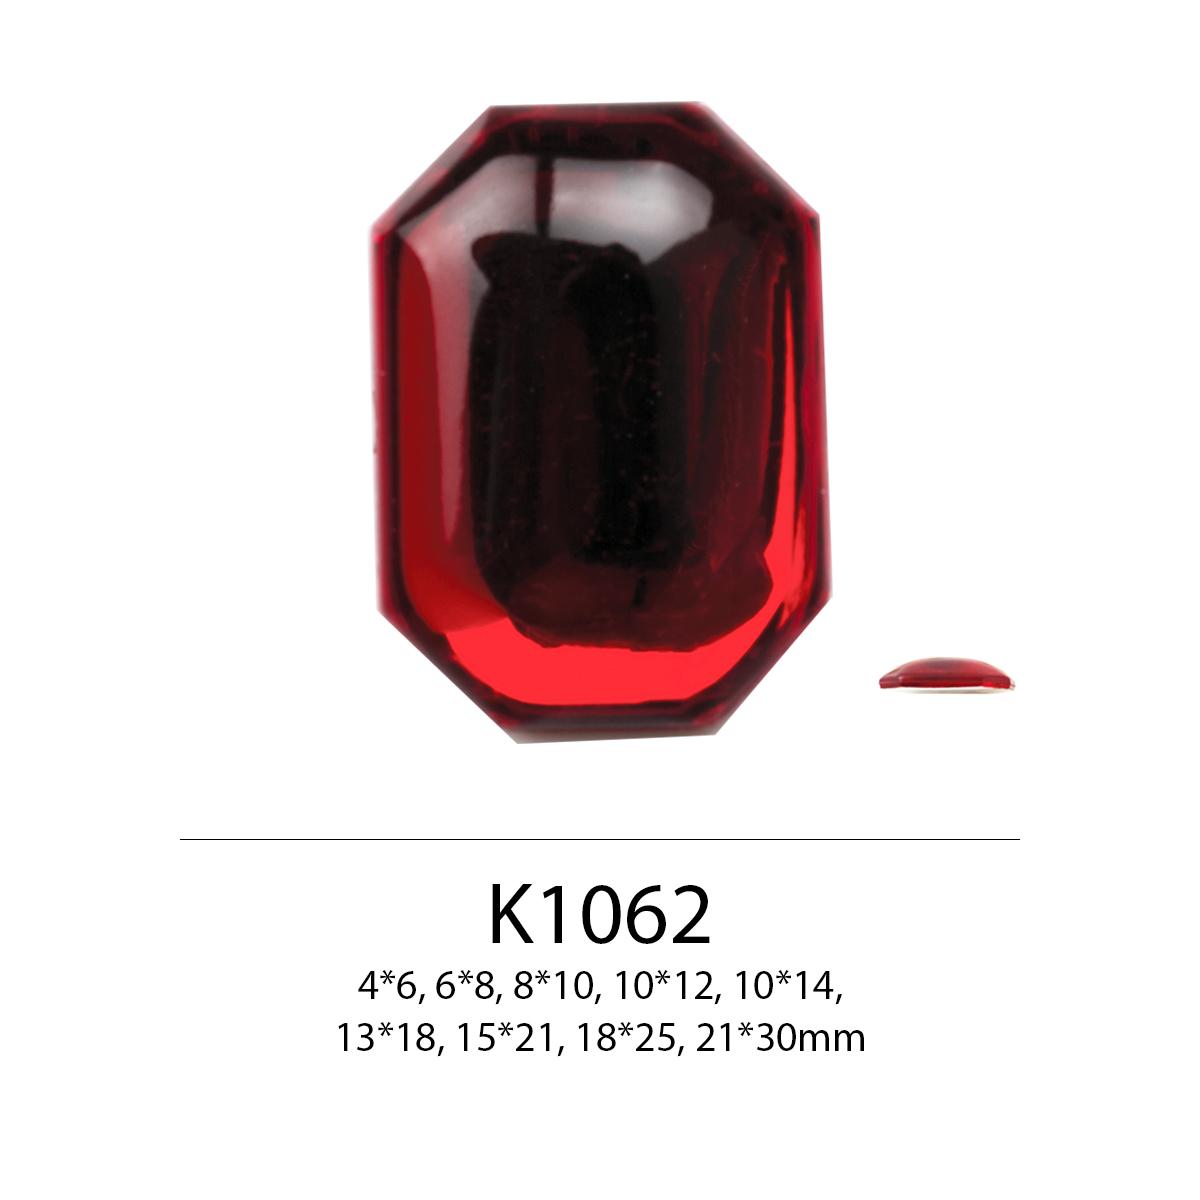 Massal Harga Octagon Bentuk Memeriksa Permukaan Ukuran Kecil Sampai Besar 13X18Mm 15X21Mm 18X25Mm 21X30Mm Flat Belakang Berlian Imitasi untuk Sepatu